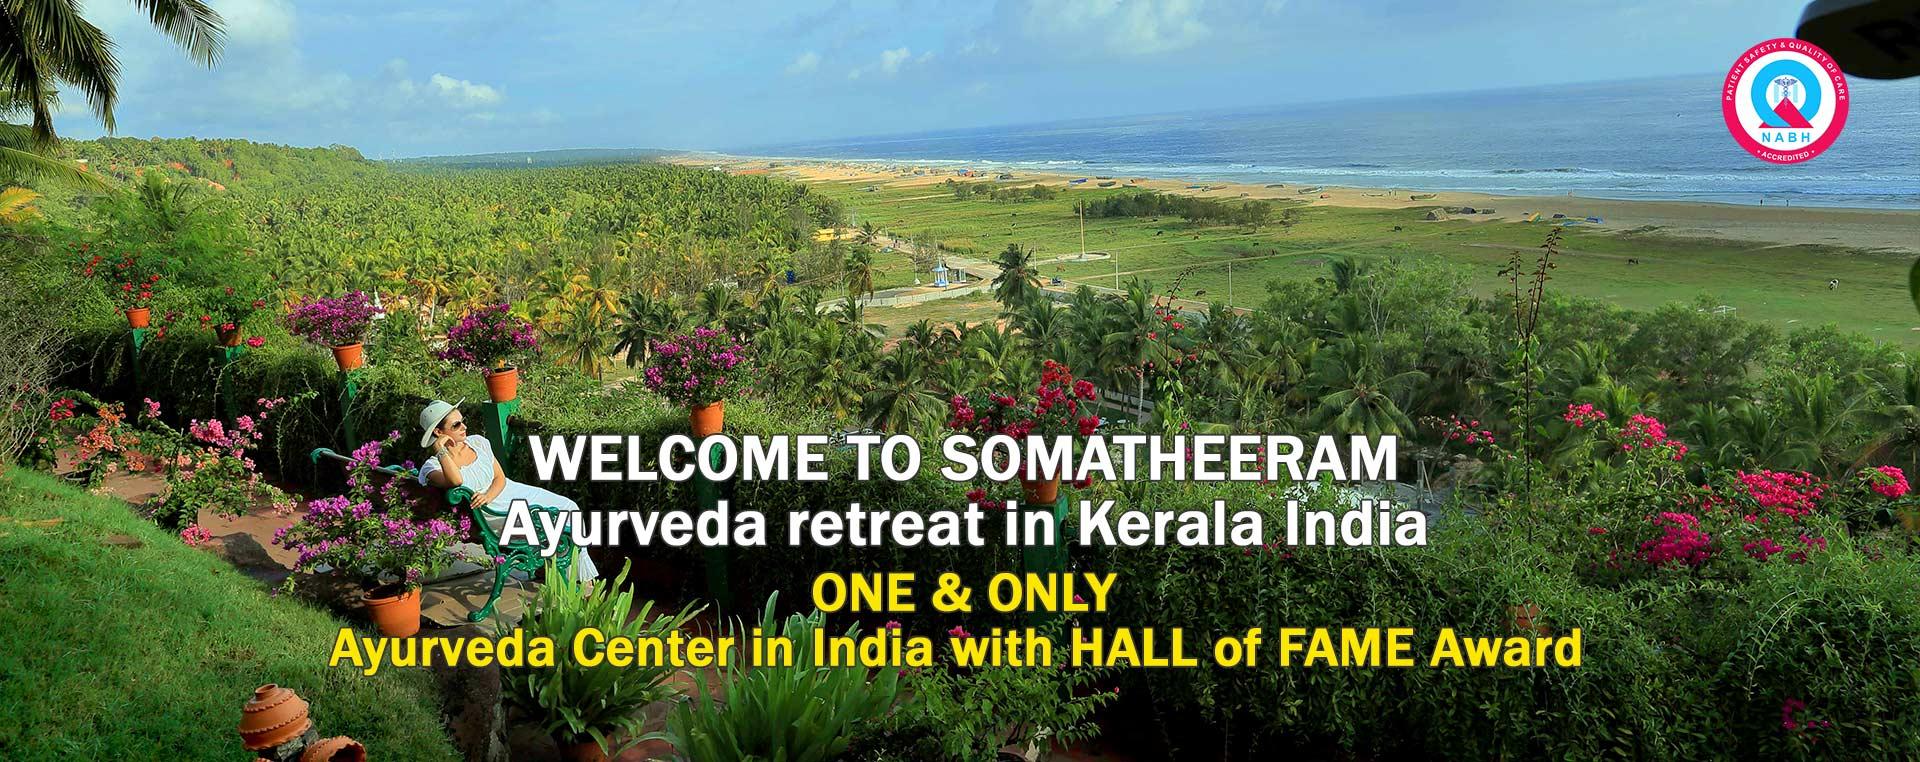 WELCOME TO SOMATHEERAM  Ayurveda retreat in Kerala India